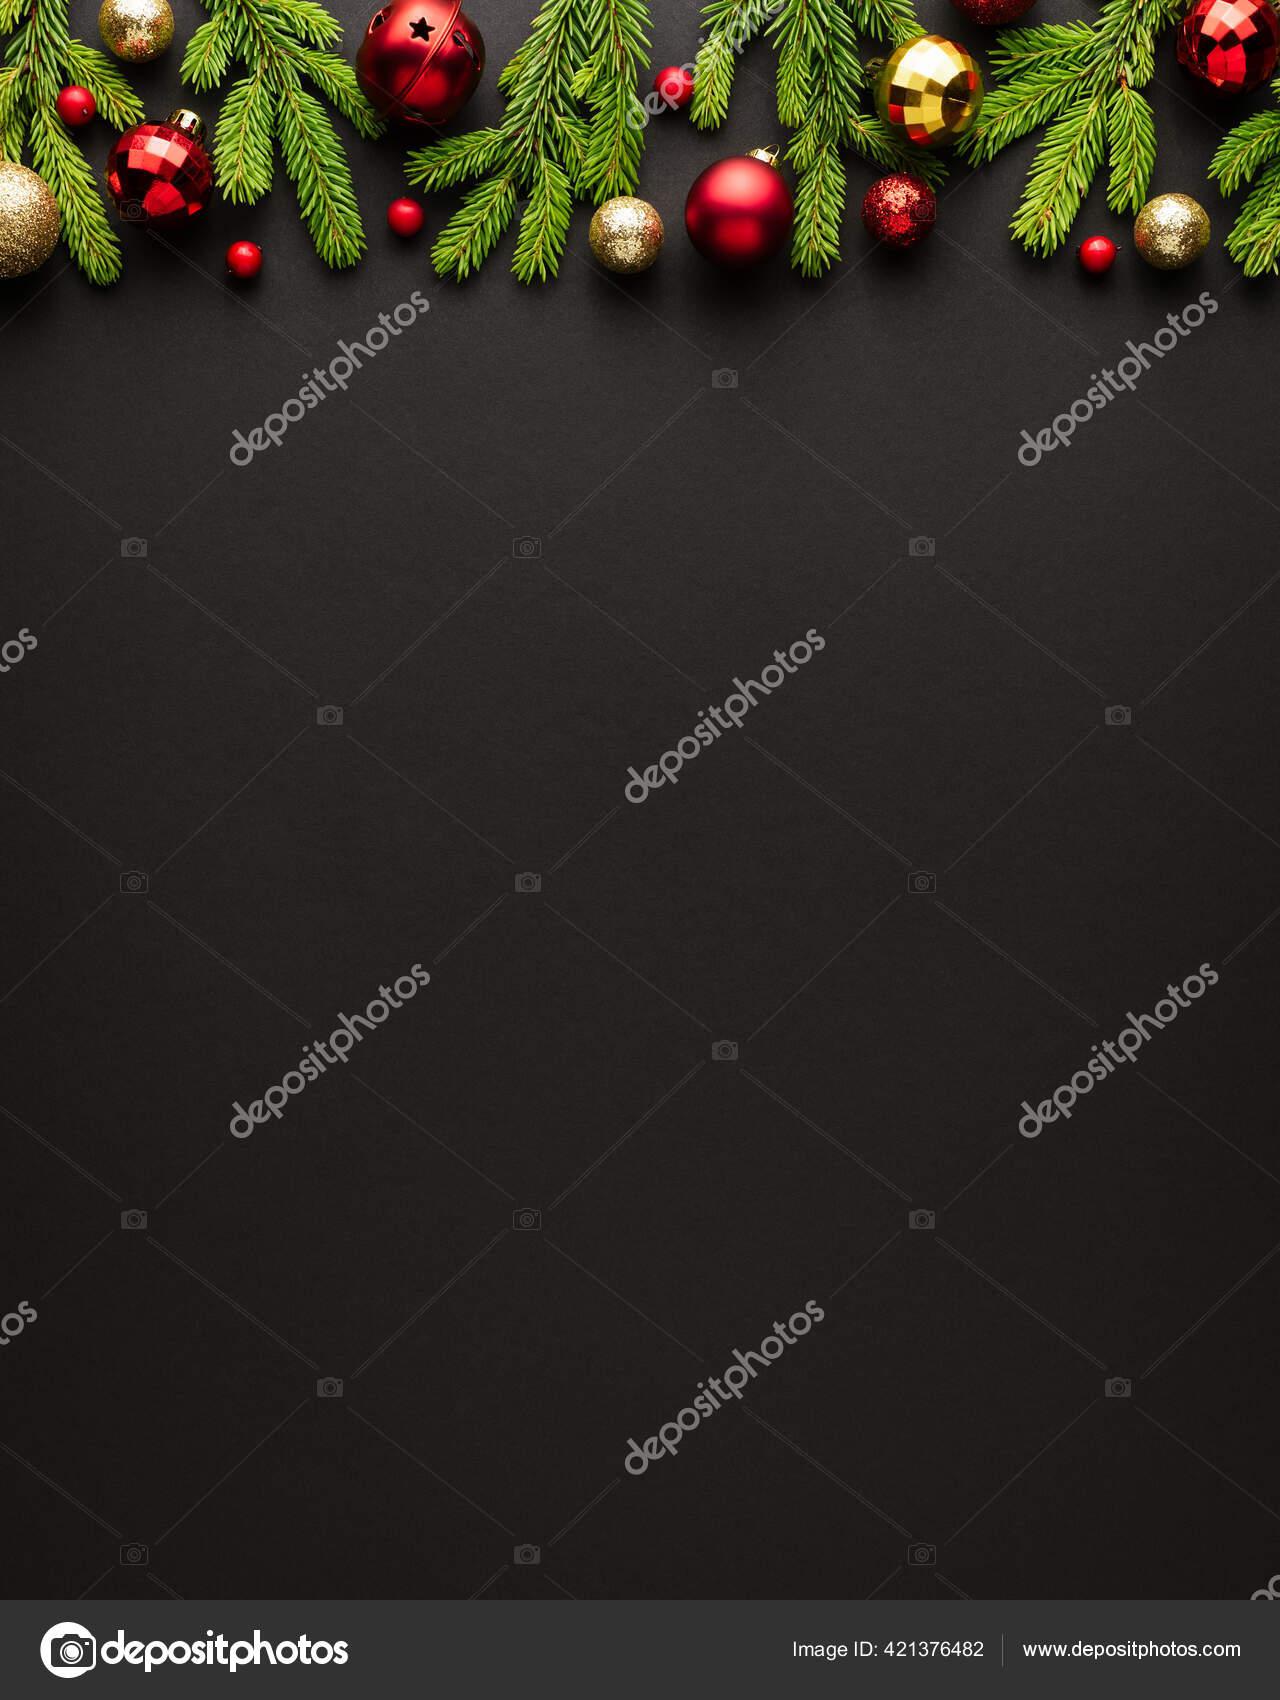 Black Christmas Background Christmas Tree Ornaments Top View Copy Space Stock Photo C Kotenko 421376482